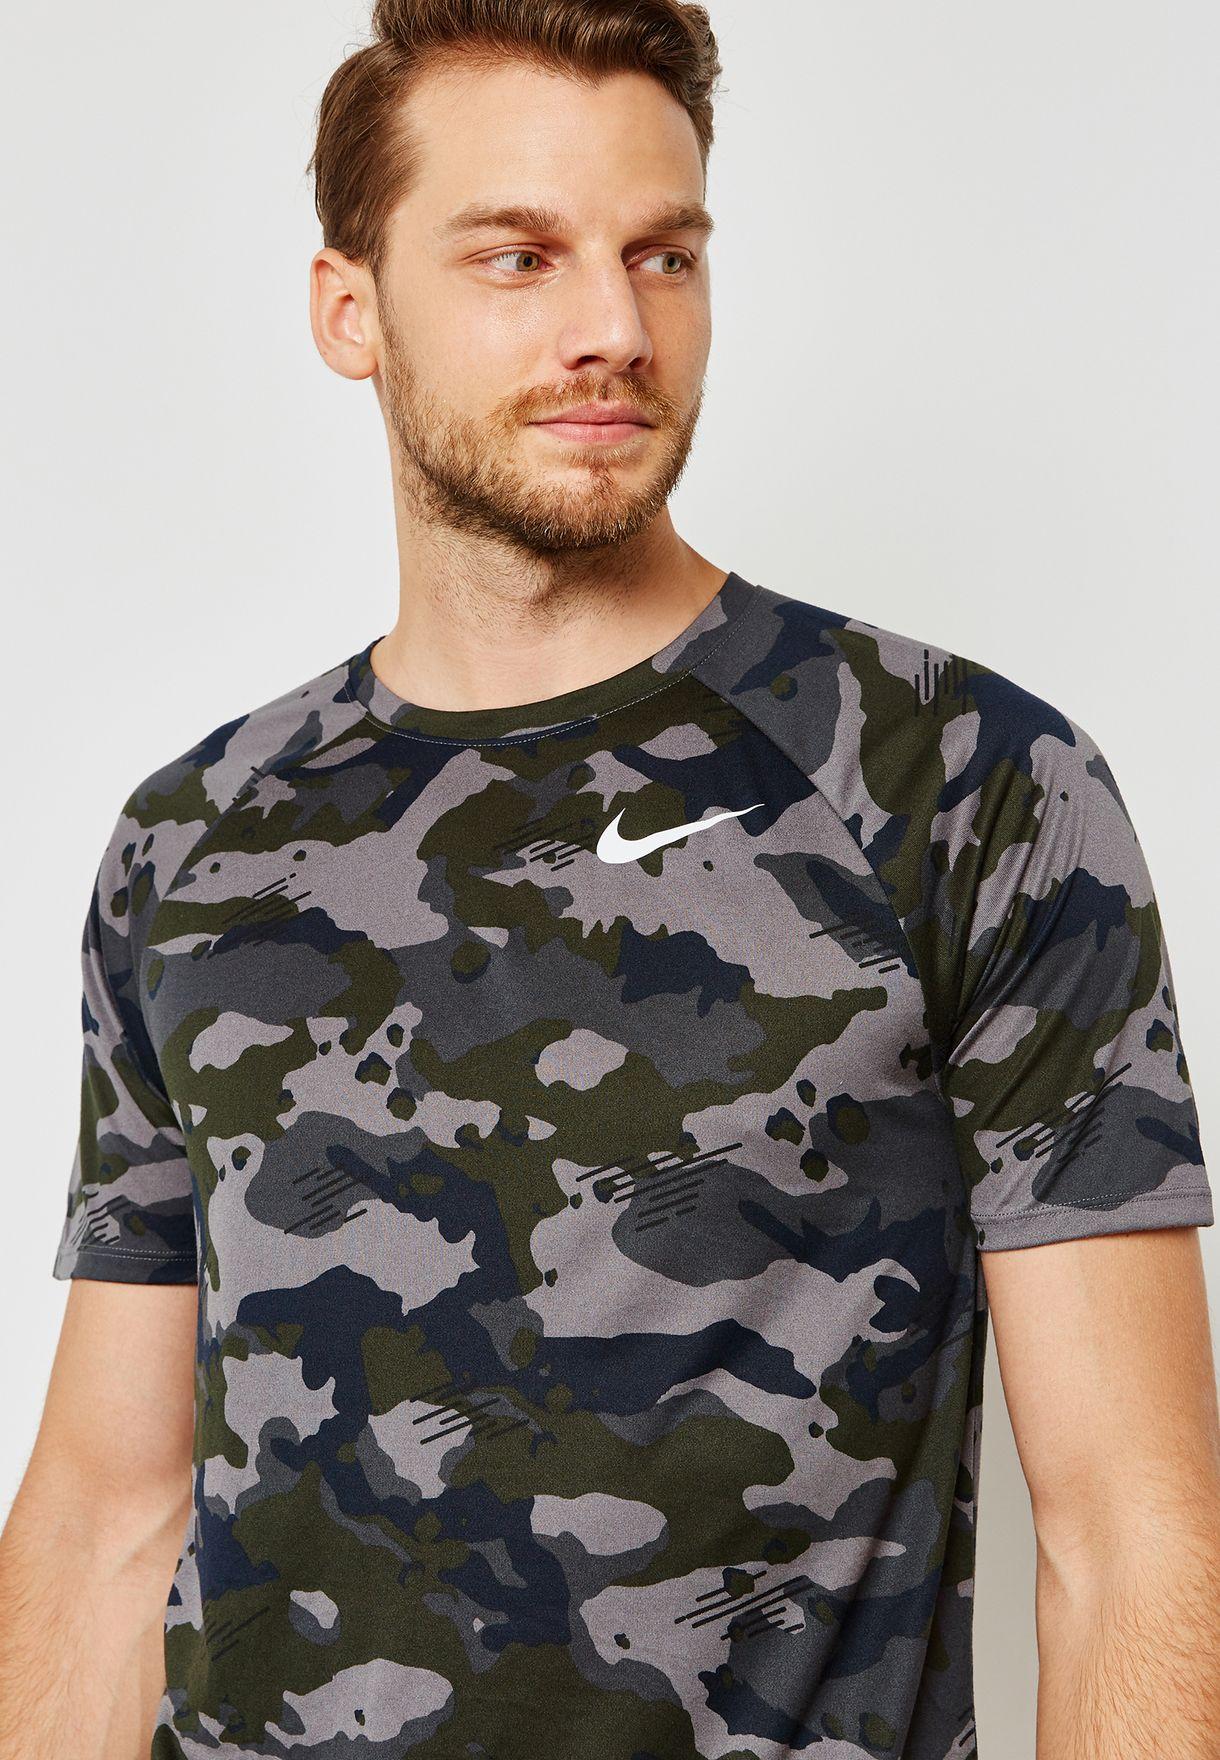 6319104d3 Shop Nike prints Dri-FIT Camo T-Shirt 923524-036 for Men in UAE ...